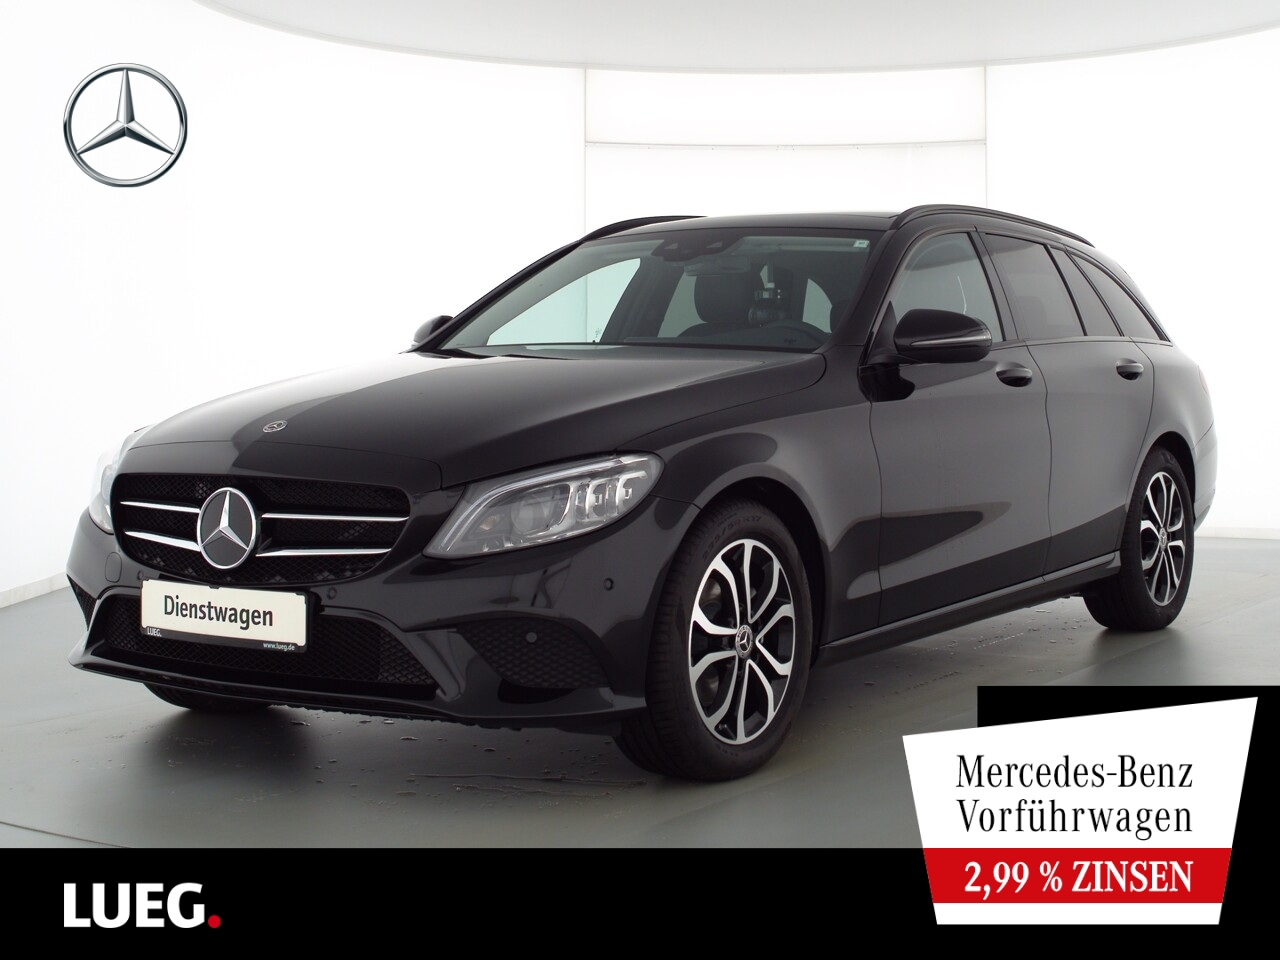 Mercedes-Benz C 180 T AVANTGARDE+NIGHT+AHK+PANO+MULTIBEAM+TOTW, Jahr 2021, Benzin